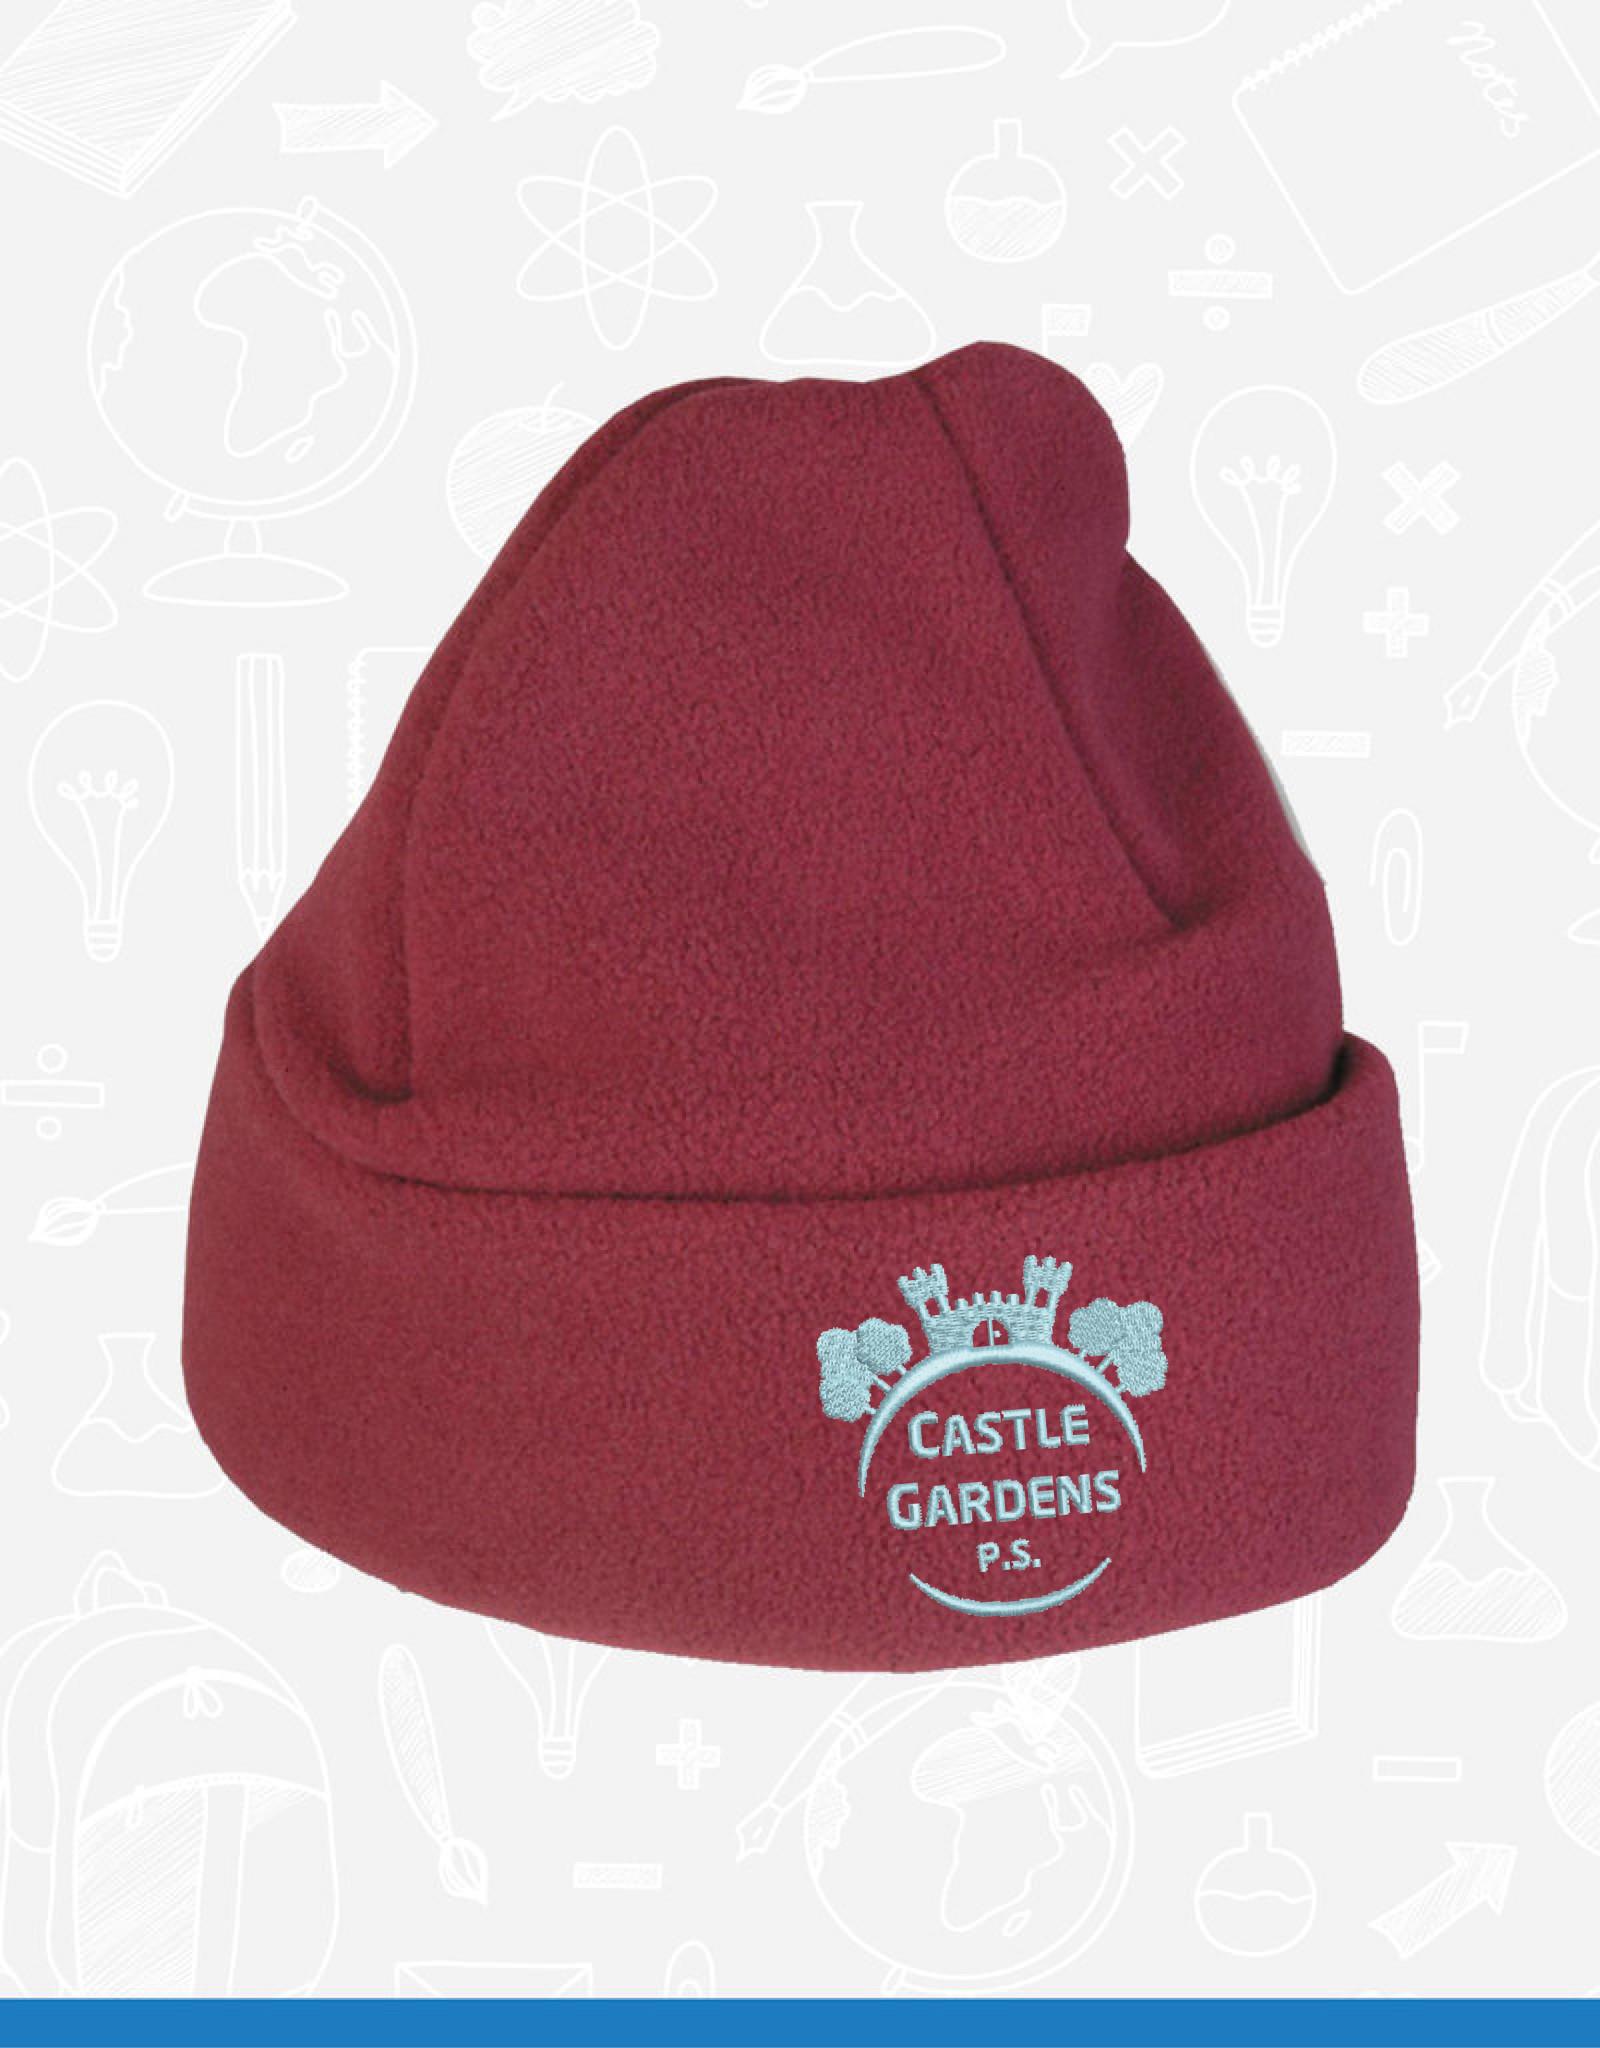 William Turner Castle Gardens Fleece Hat (FH99)